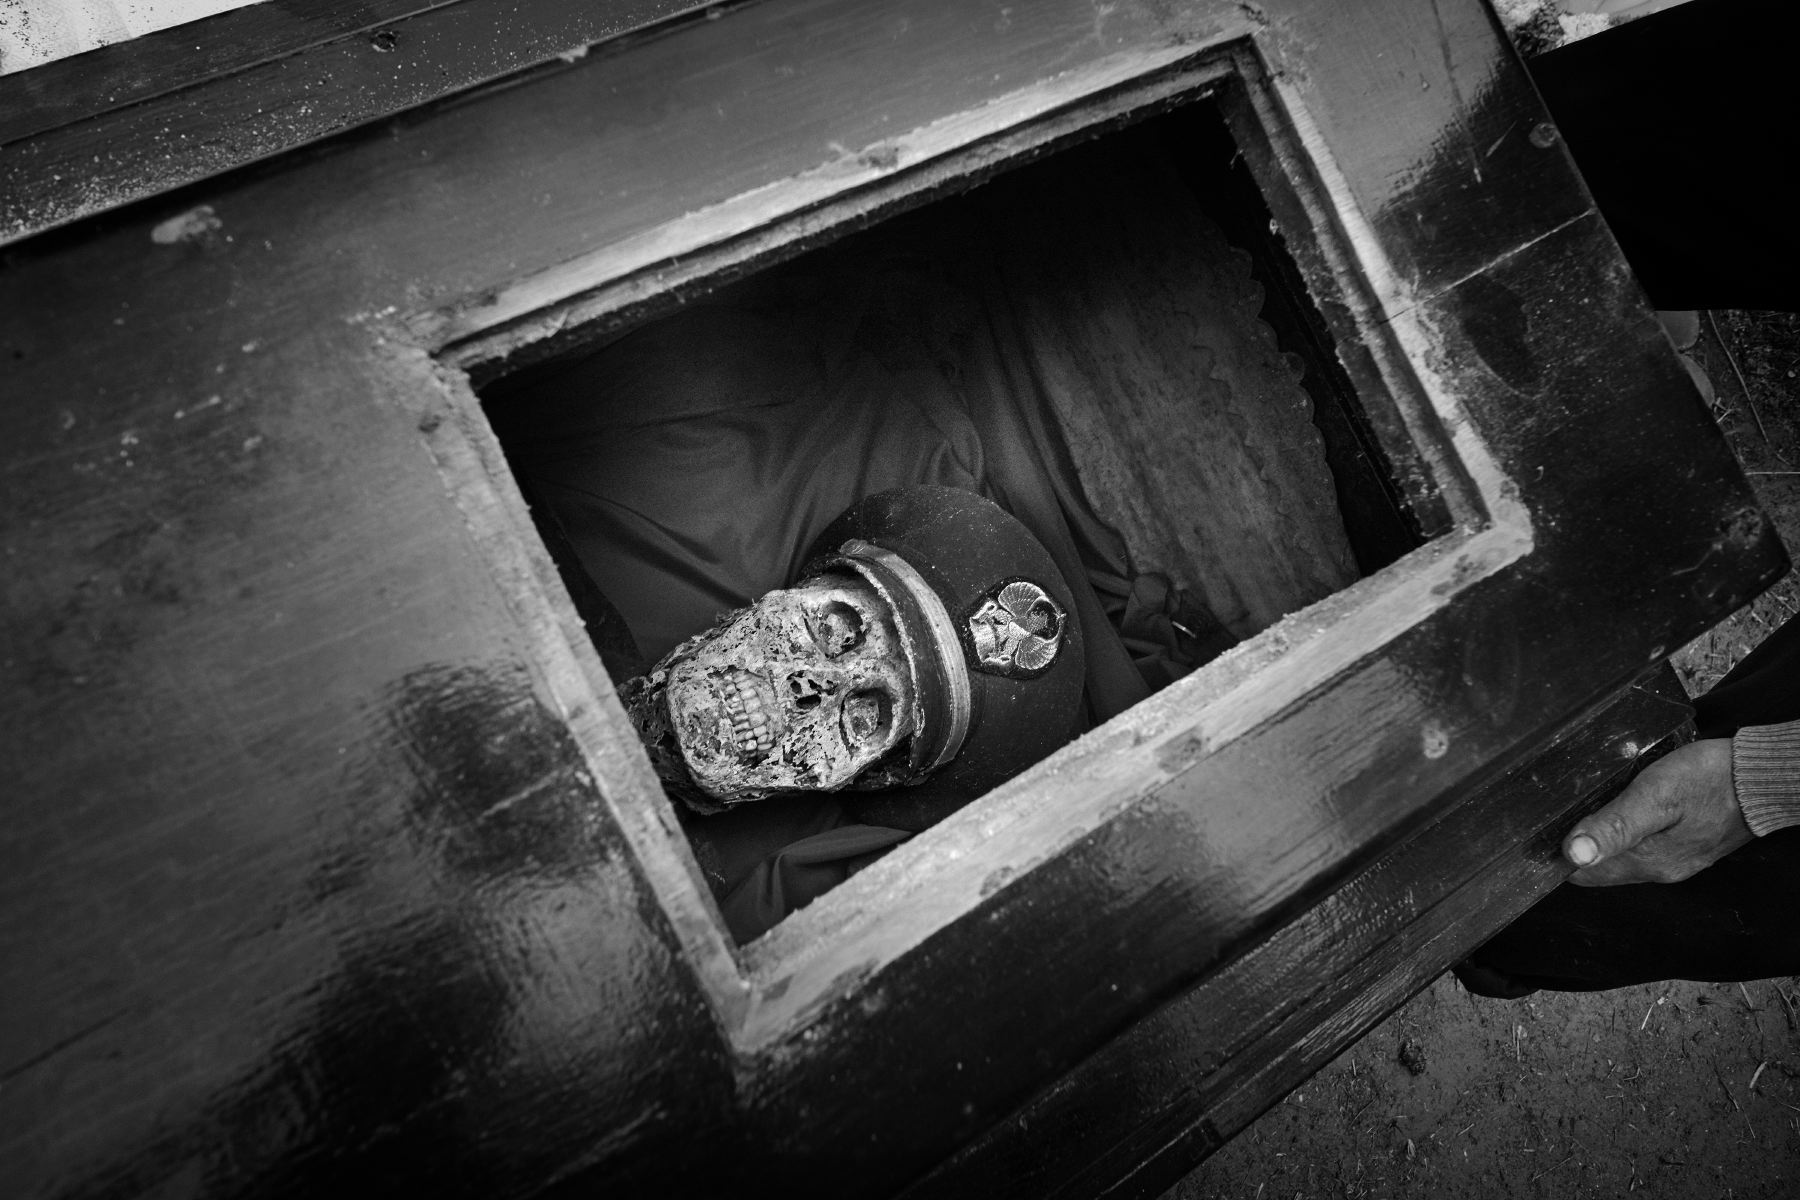 AlainSchroeder_Series Living for Death_Untitled_04.JPG